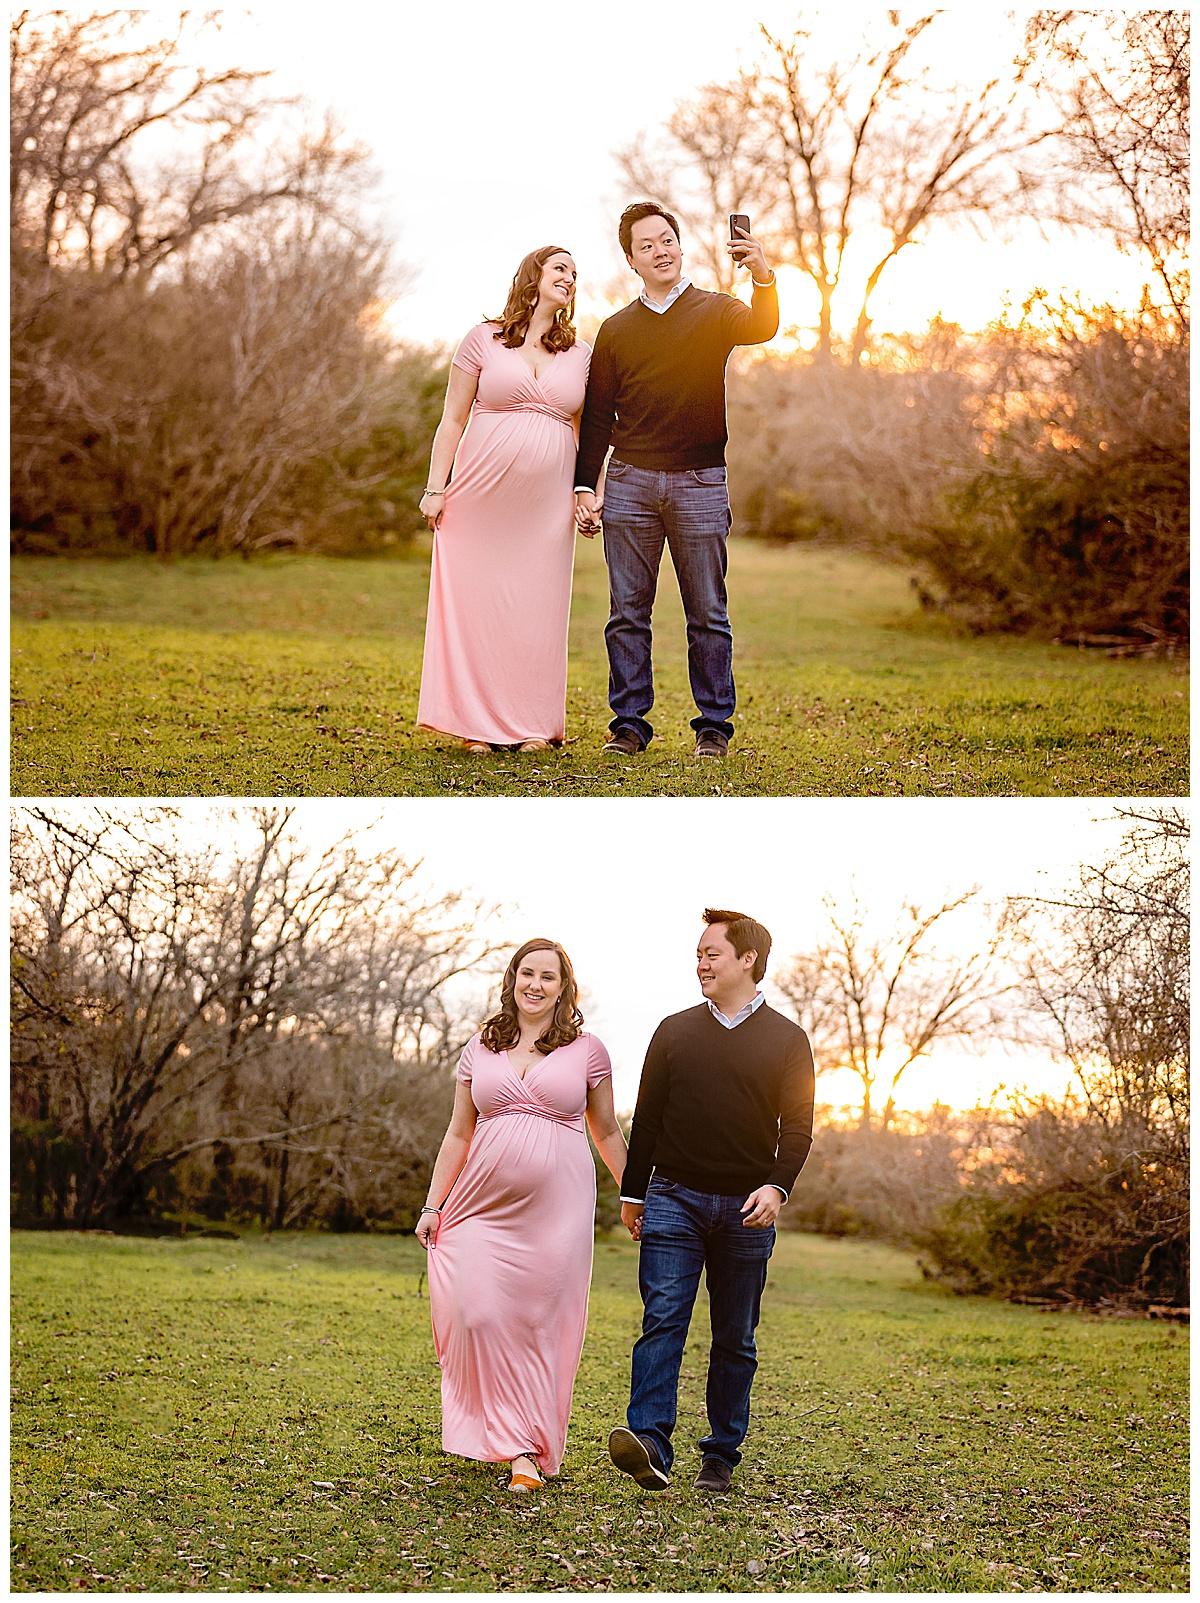 Maternity-Photographer-Texas-Carly-Barton-Photography-LaVernia-Photos_0013.jpg